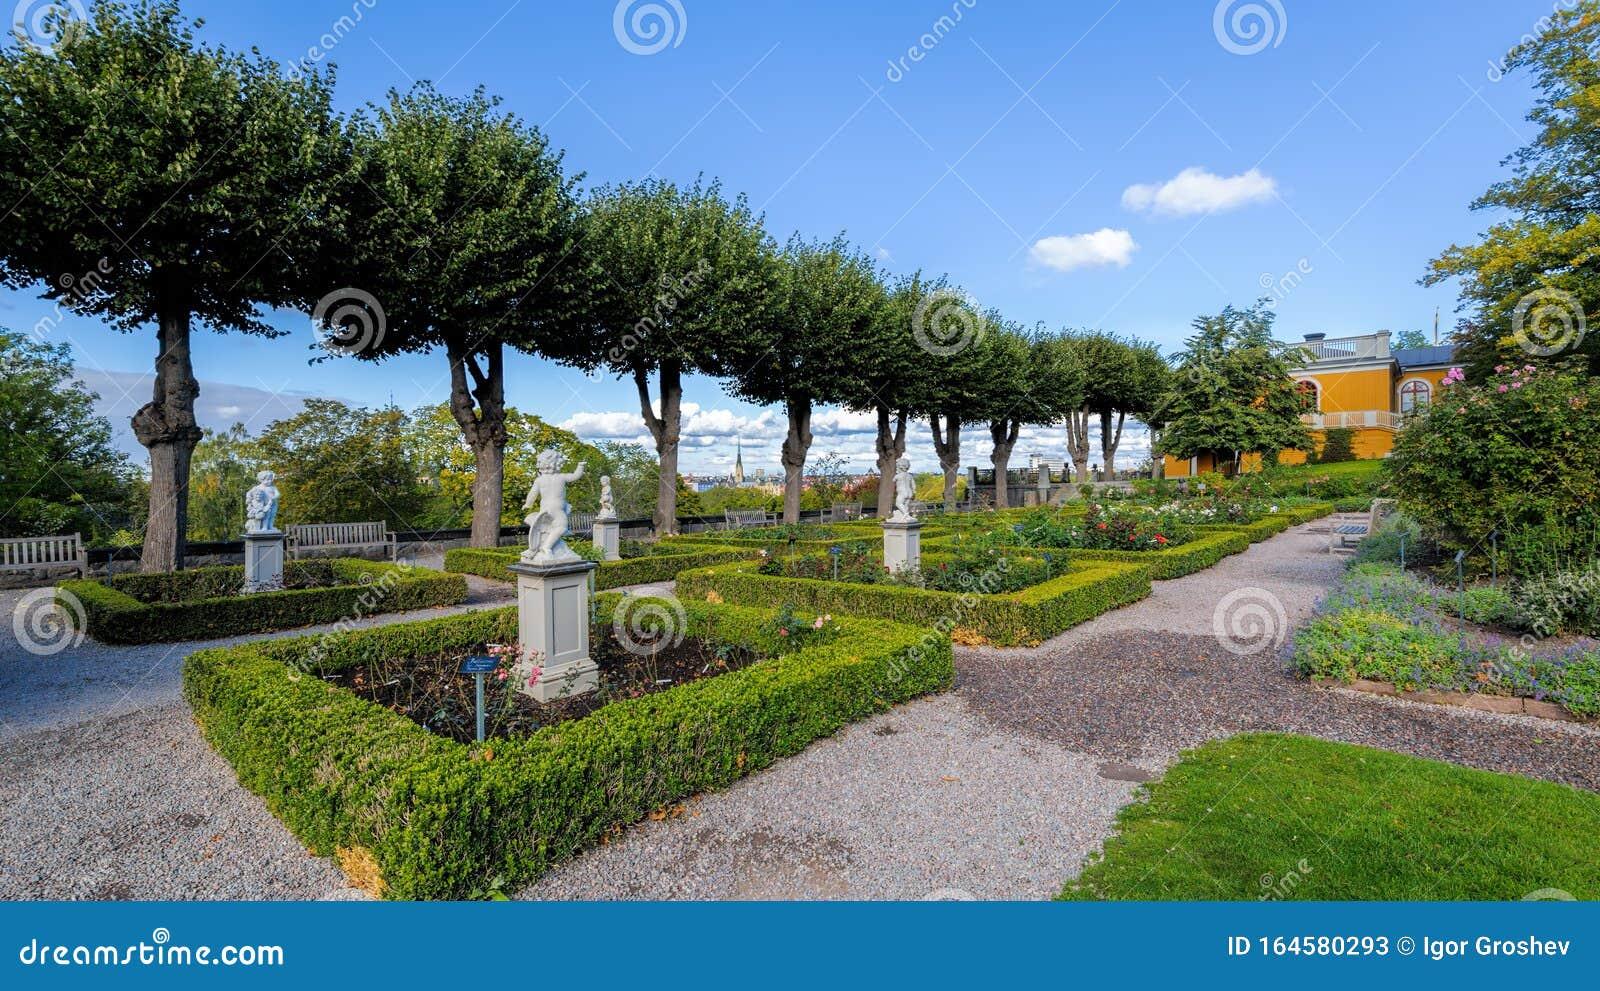 rose garden stockholm